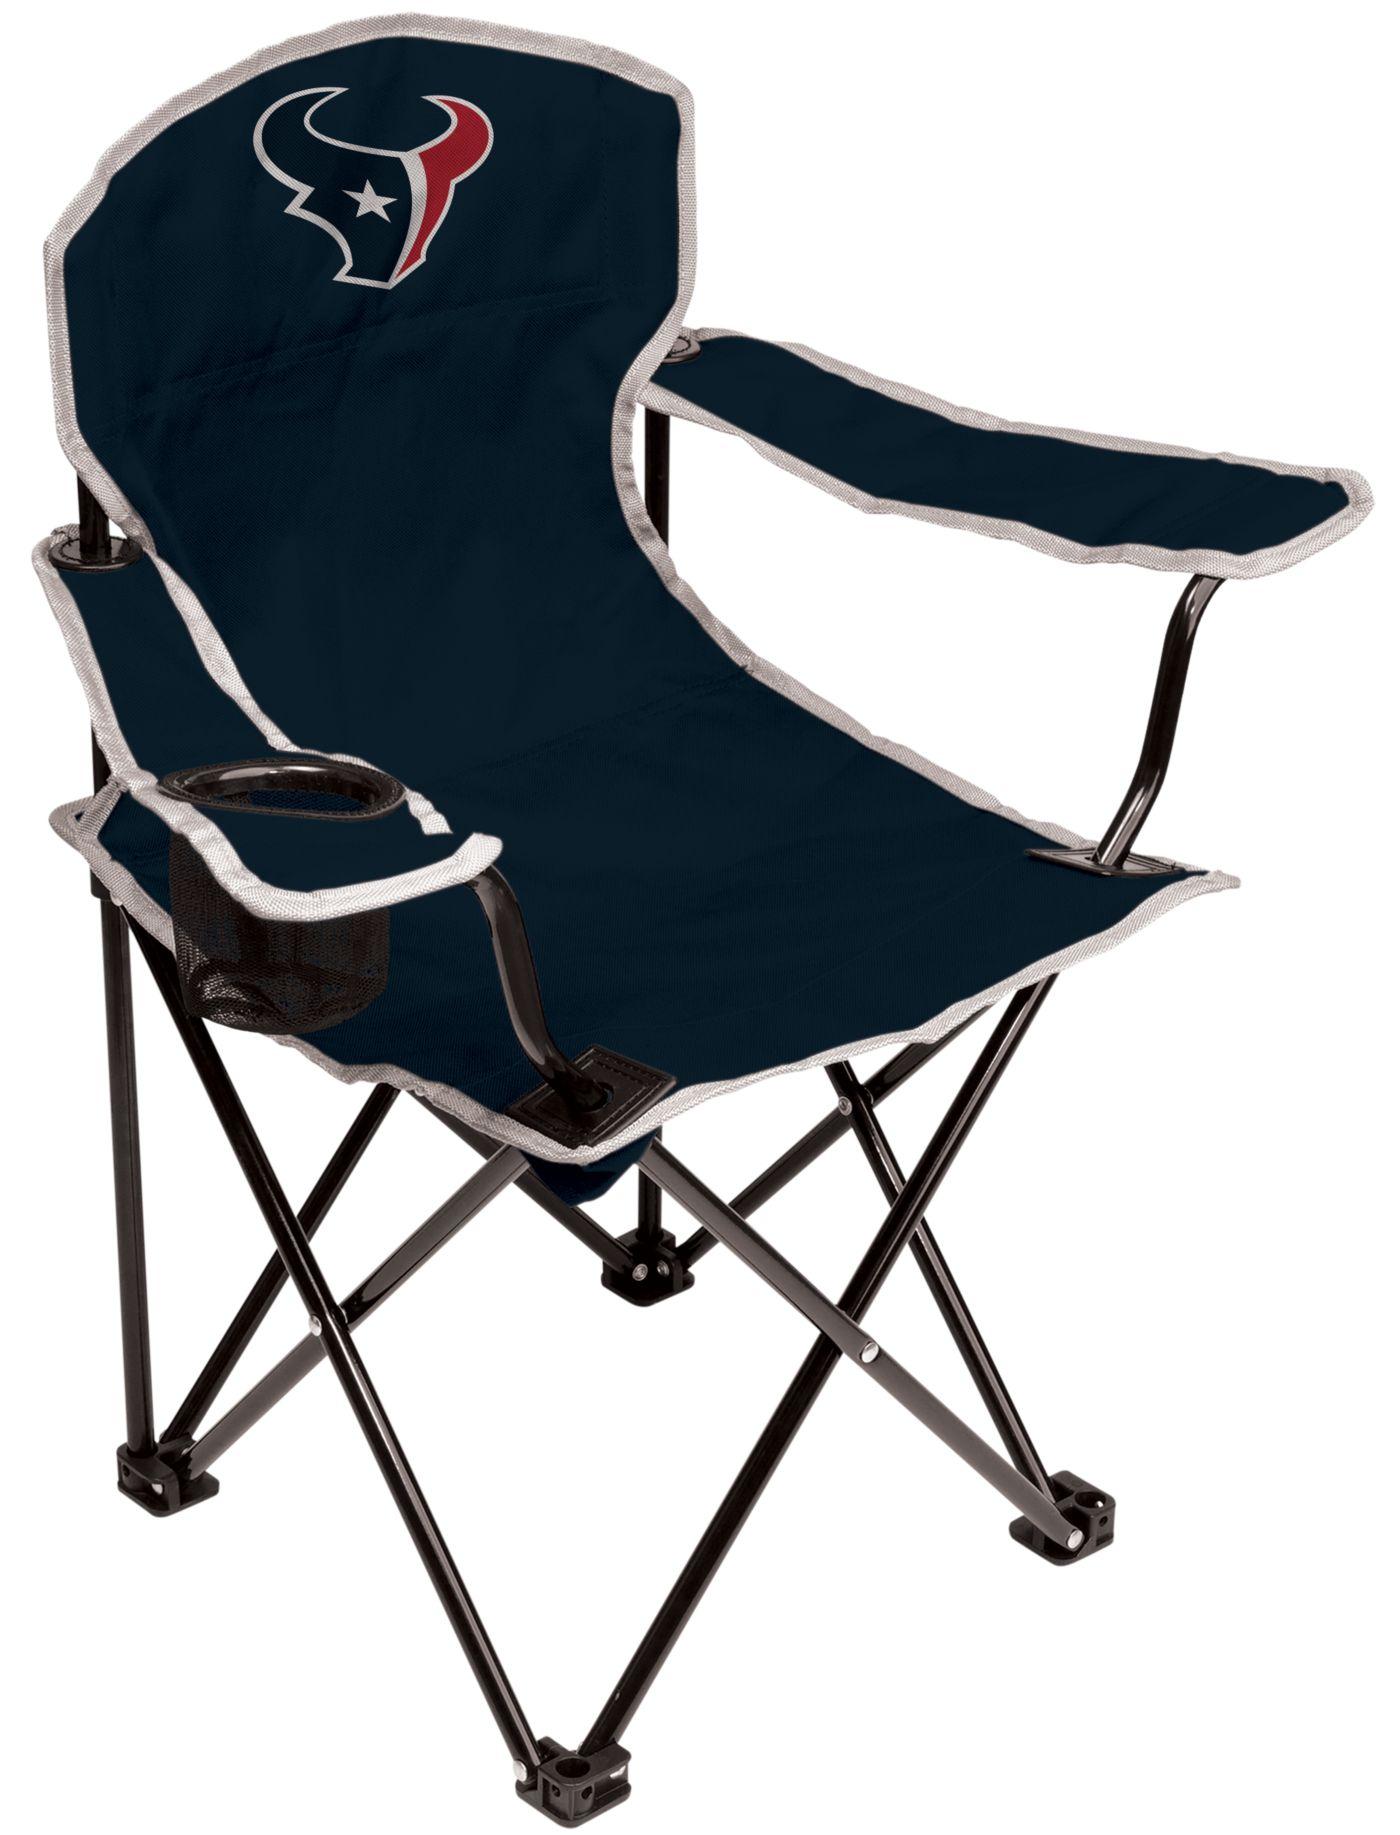 Rawlings Houston Texans Youth Chair